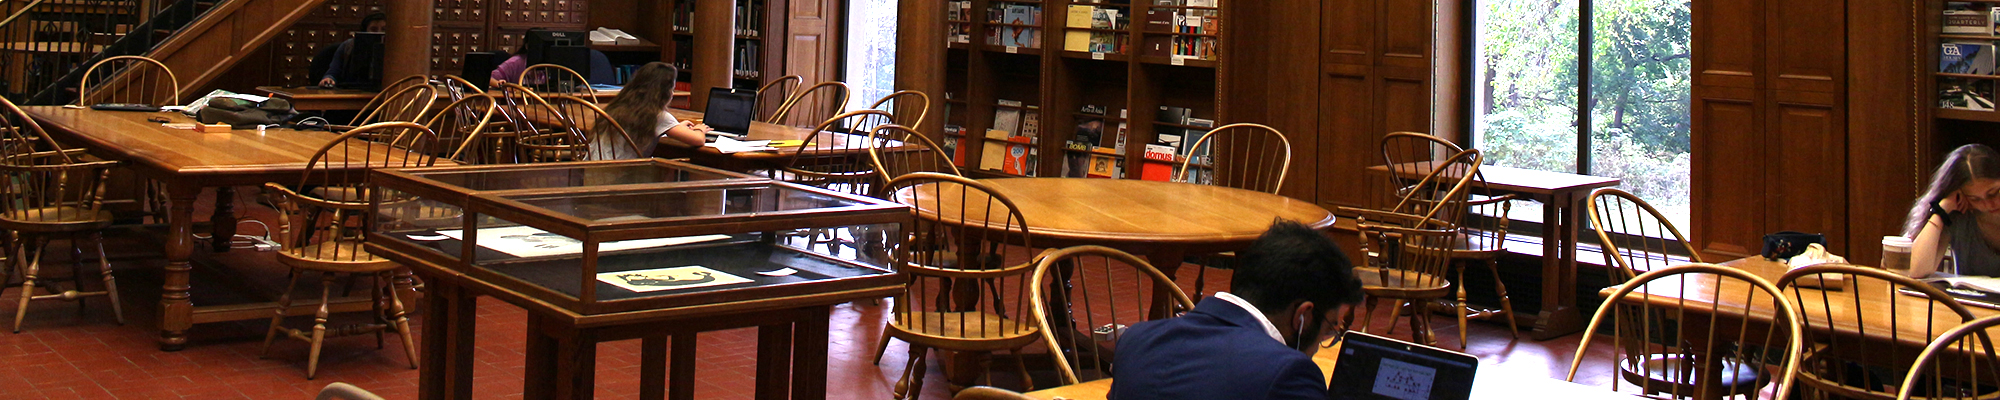 Frick Fine Arts Library